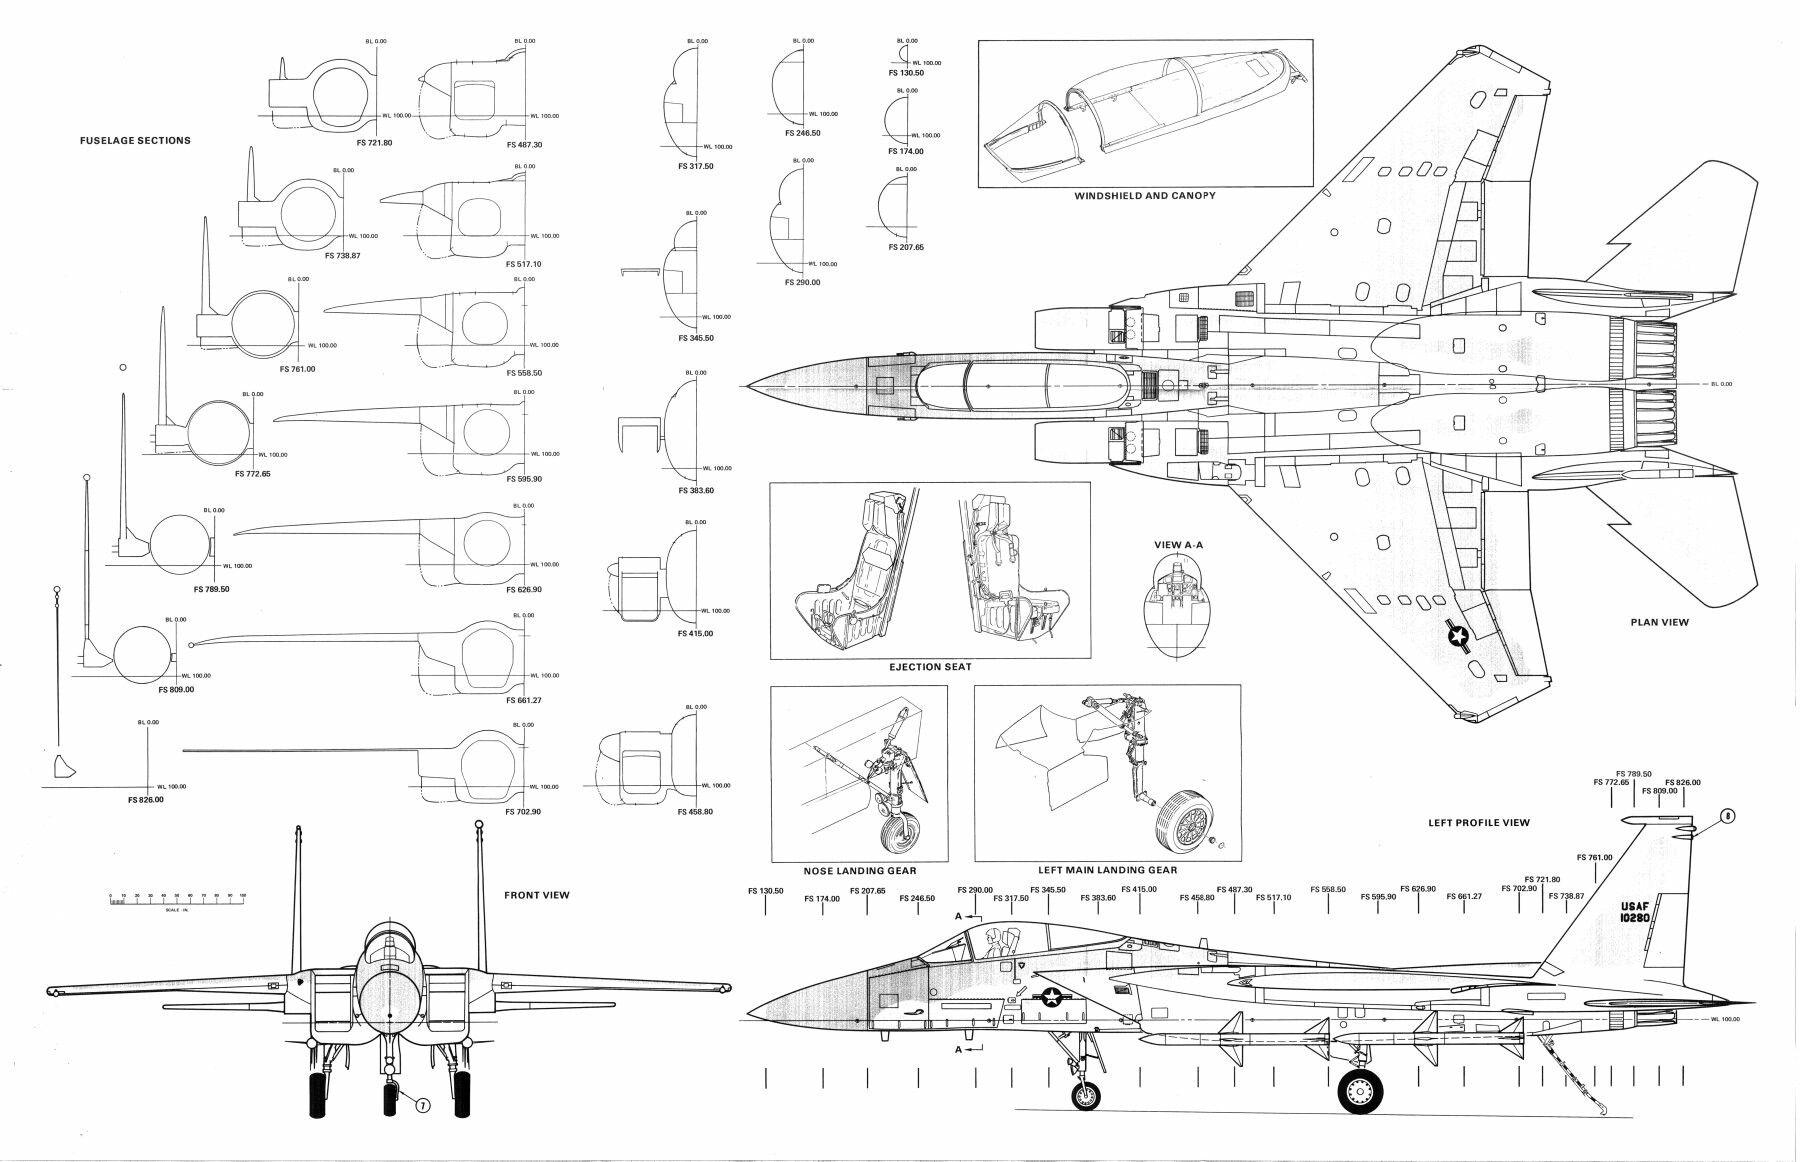 pin by jaime on machine drawings